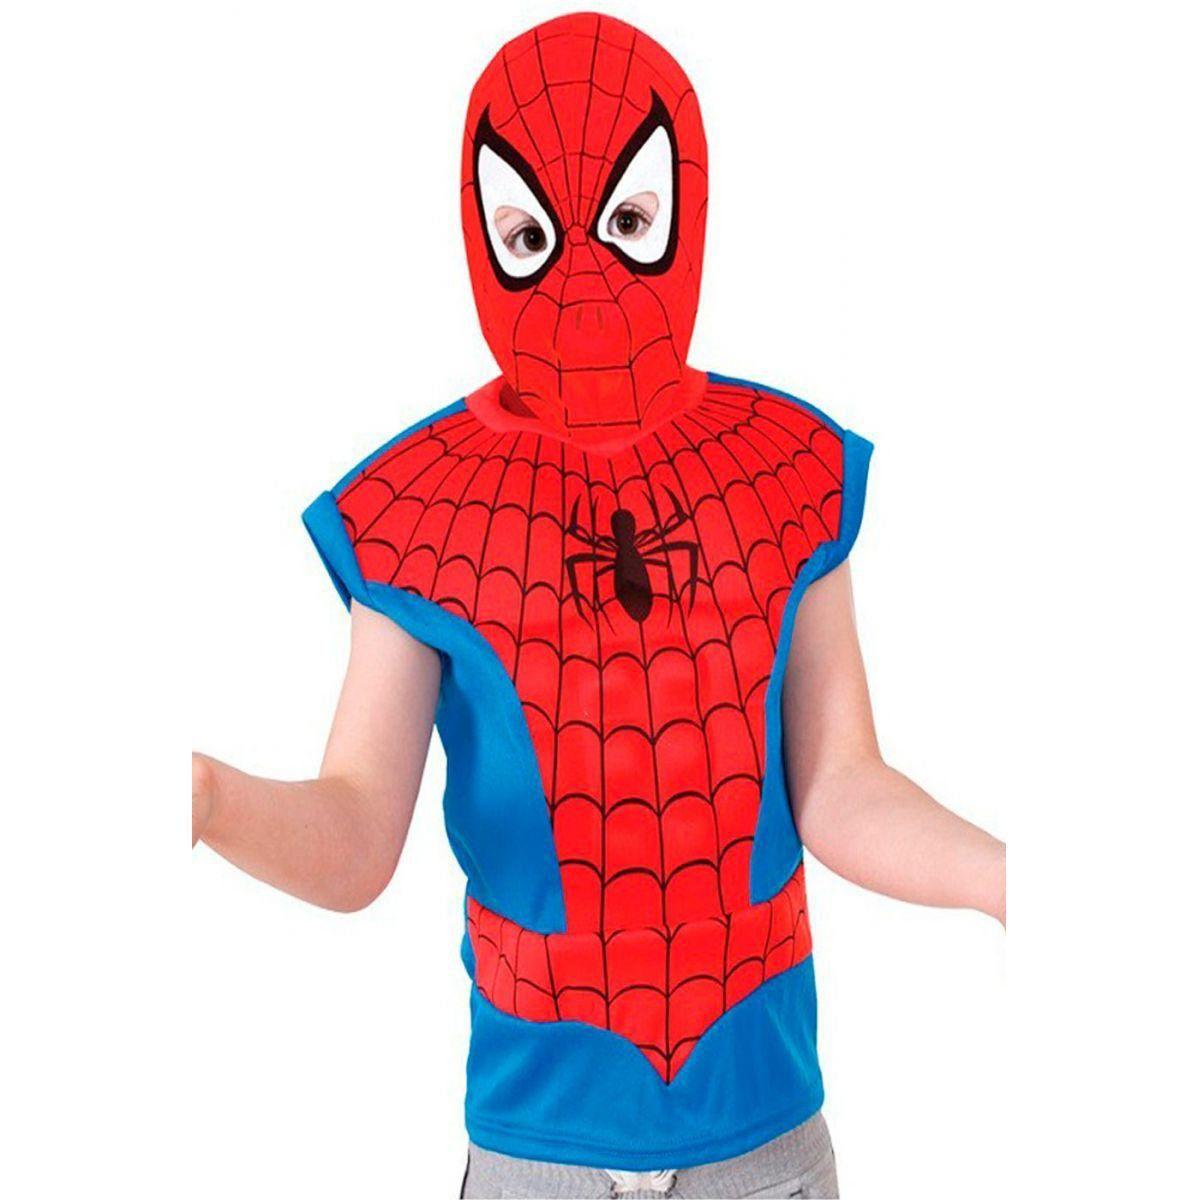 Fantasia Infantil: Spider-Man Camiseta Muscle Chest U - Rubies